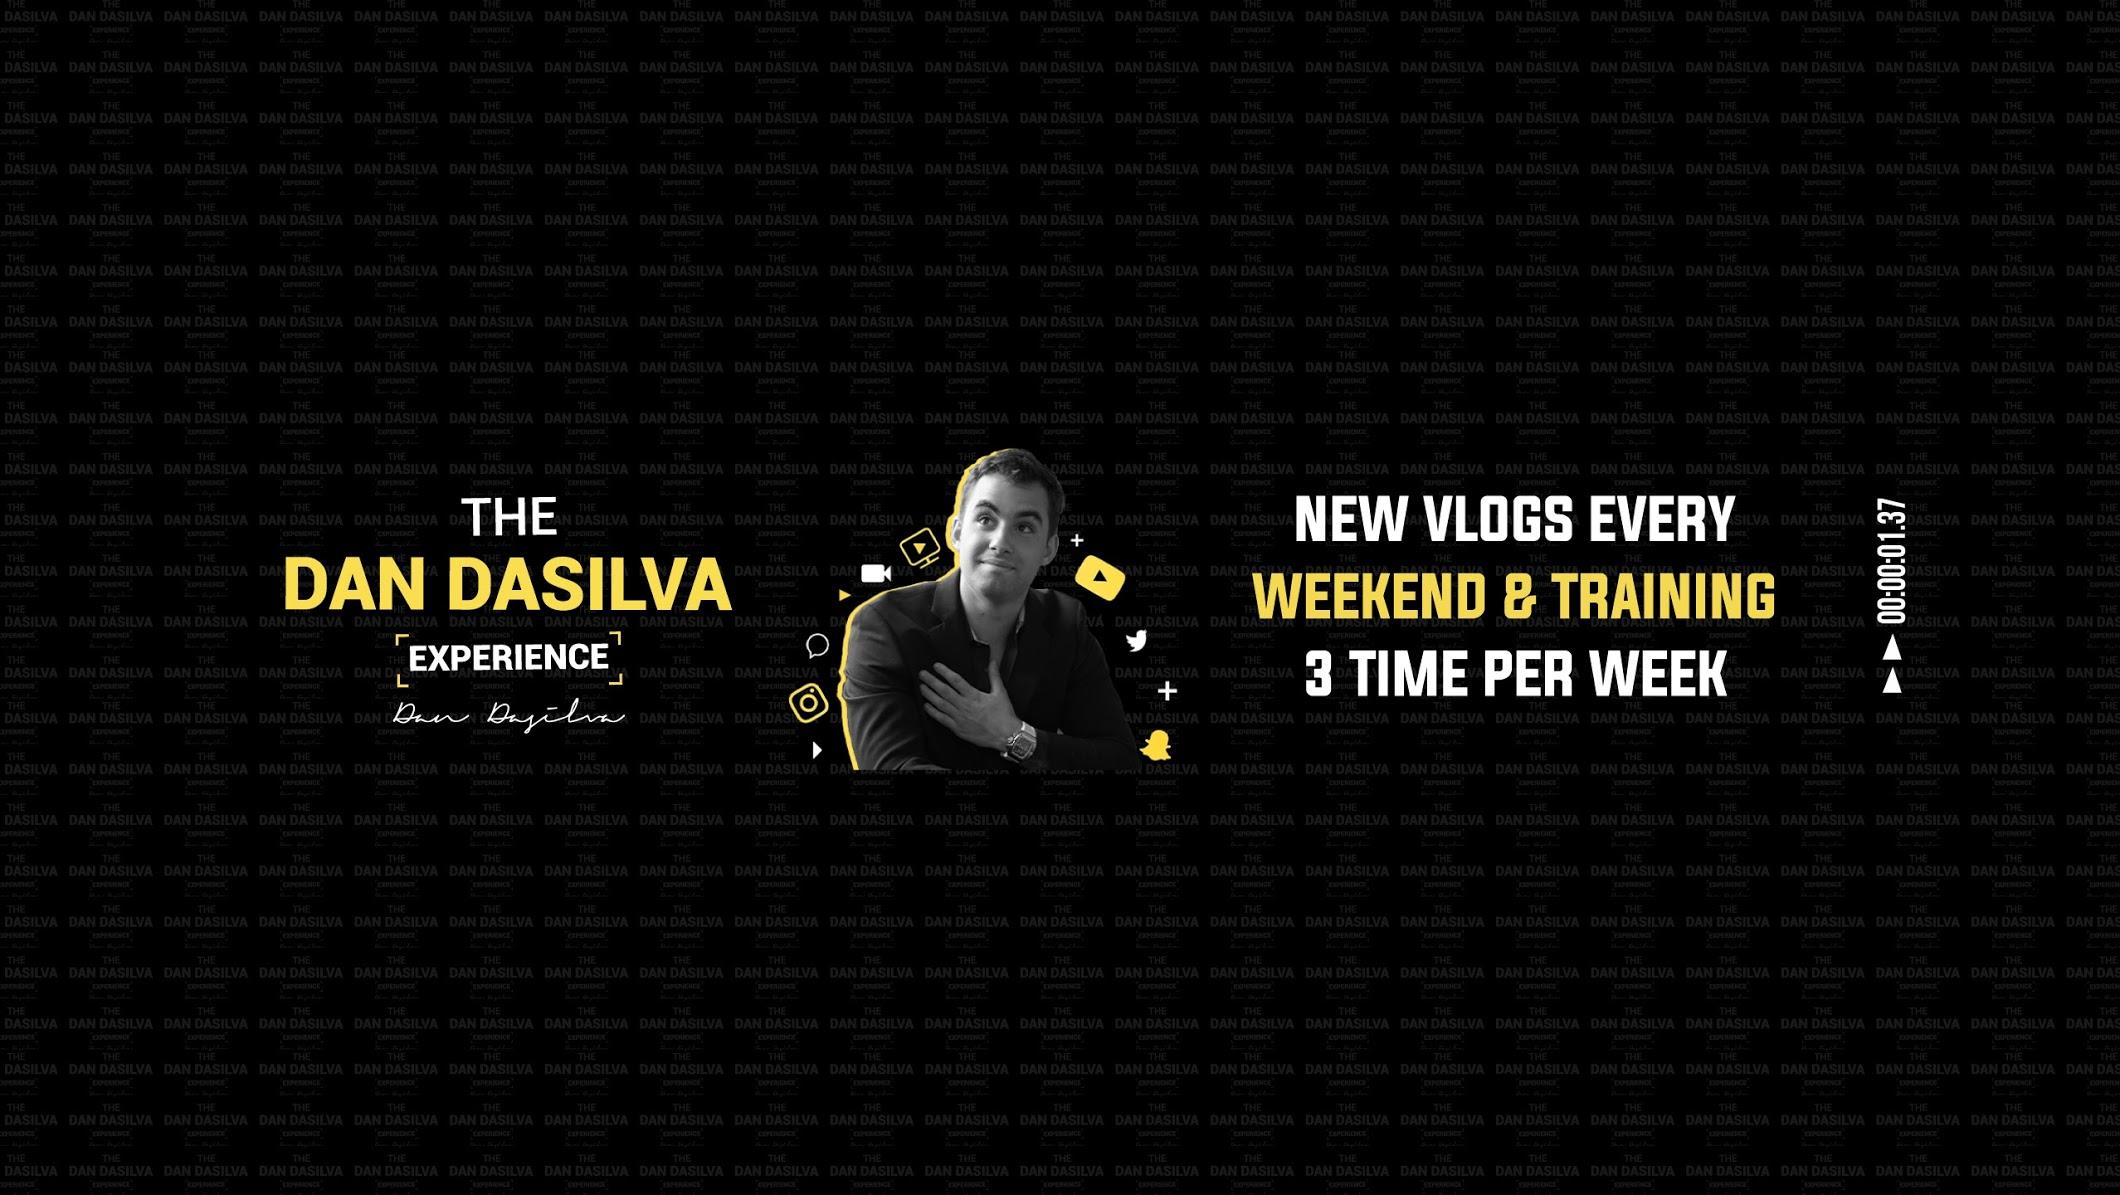 Dan Dasilva- eCommerce Youtube Channels 2021